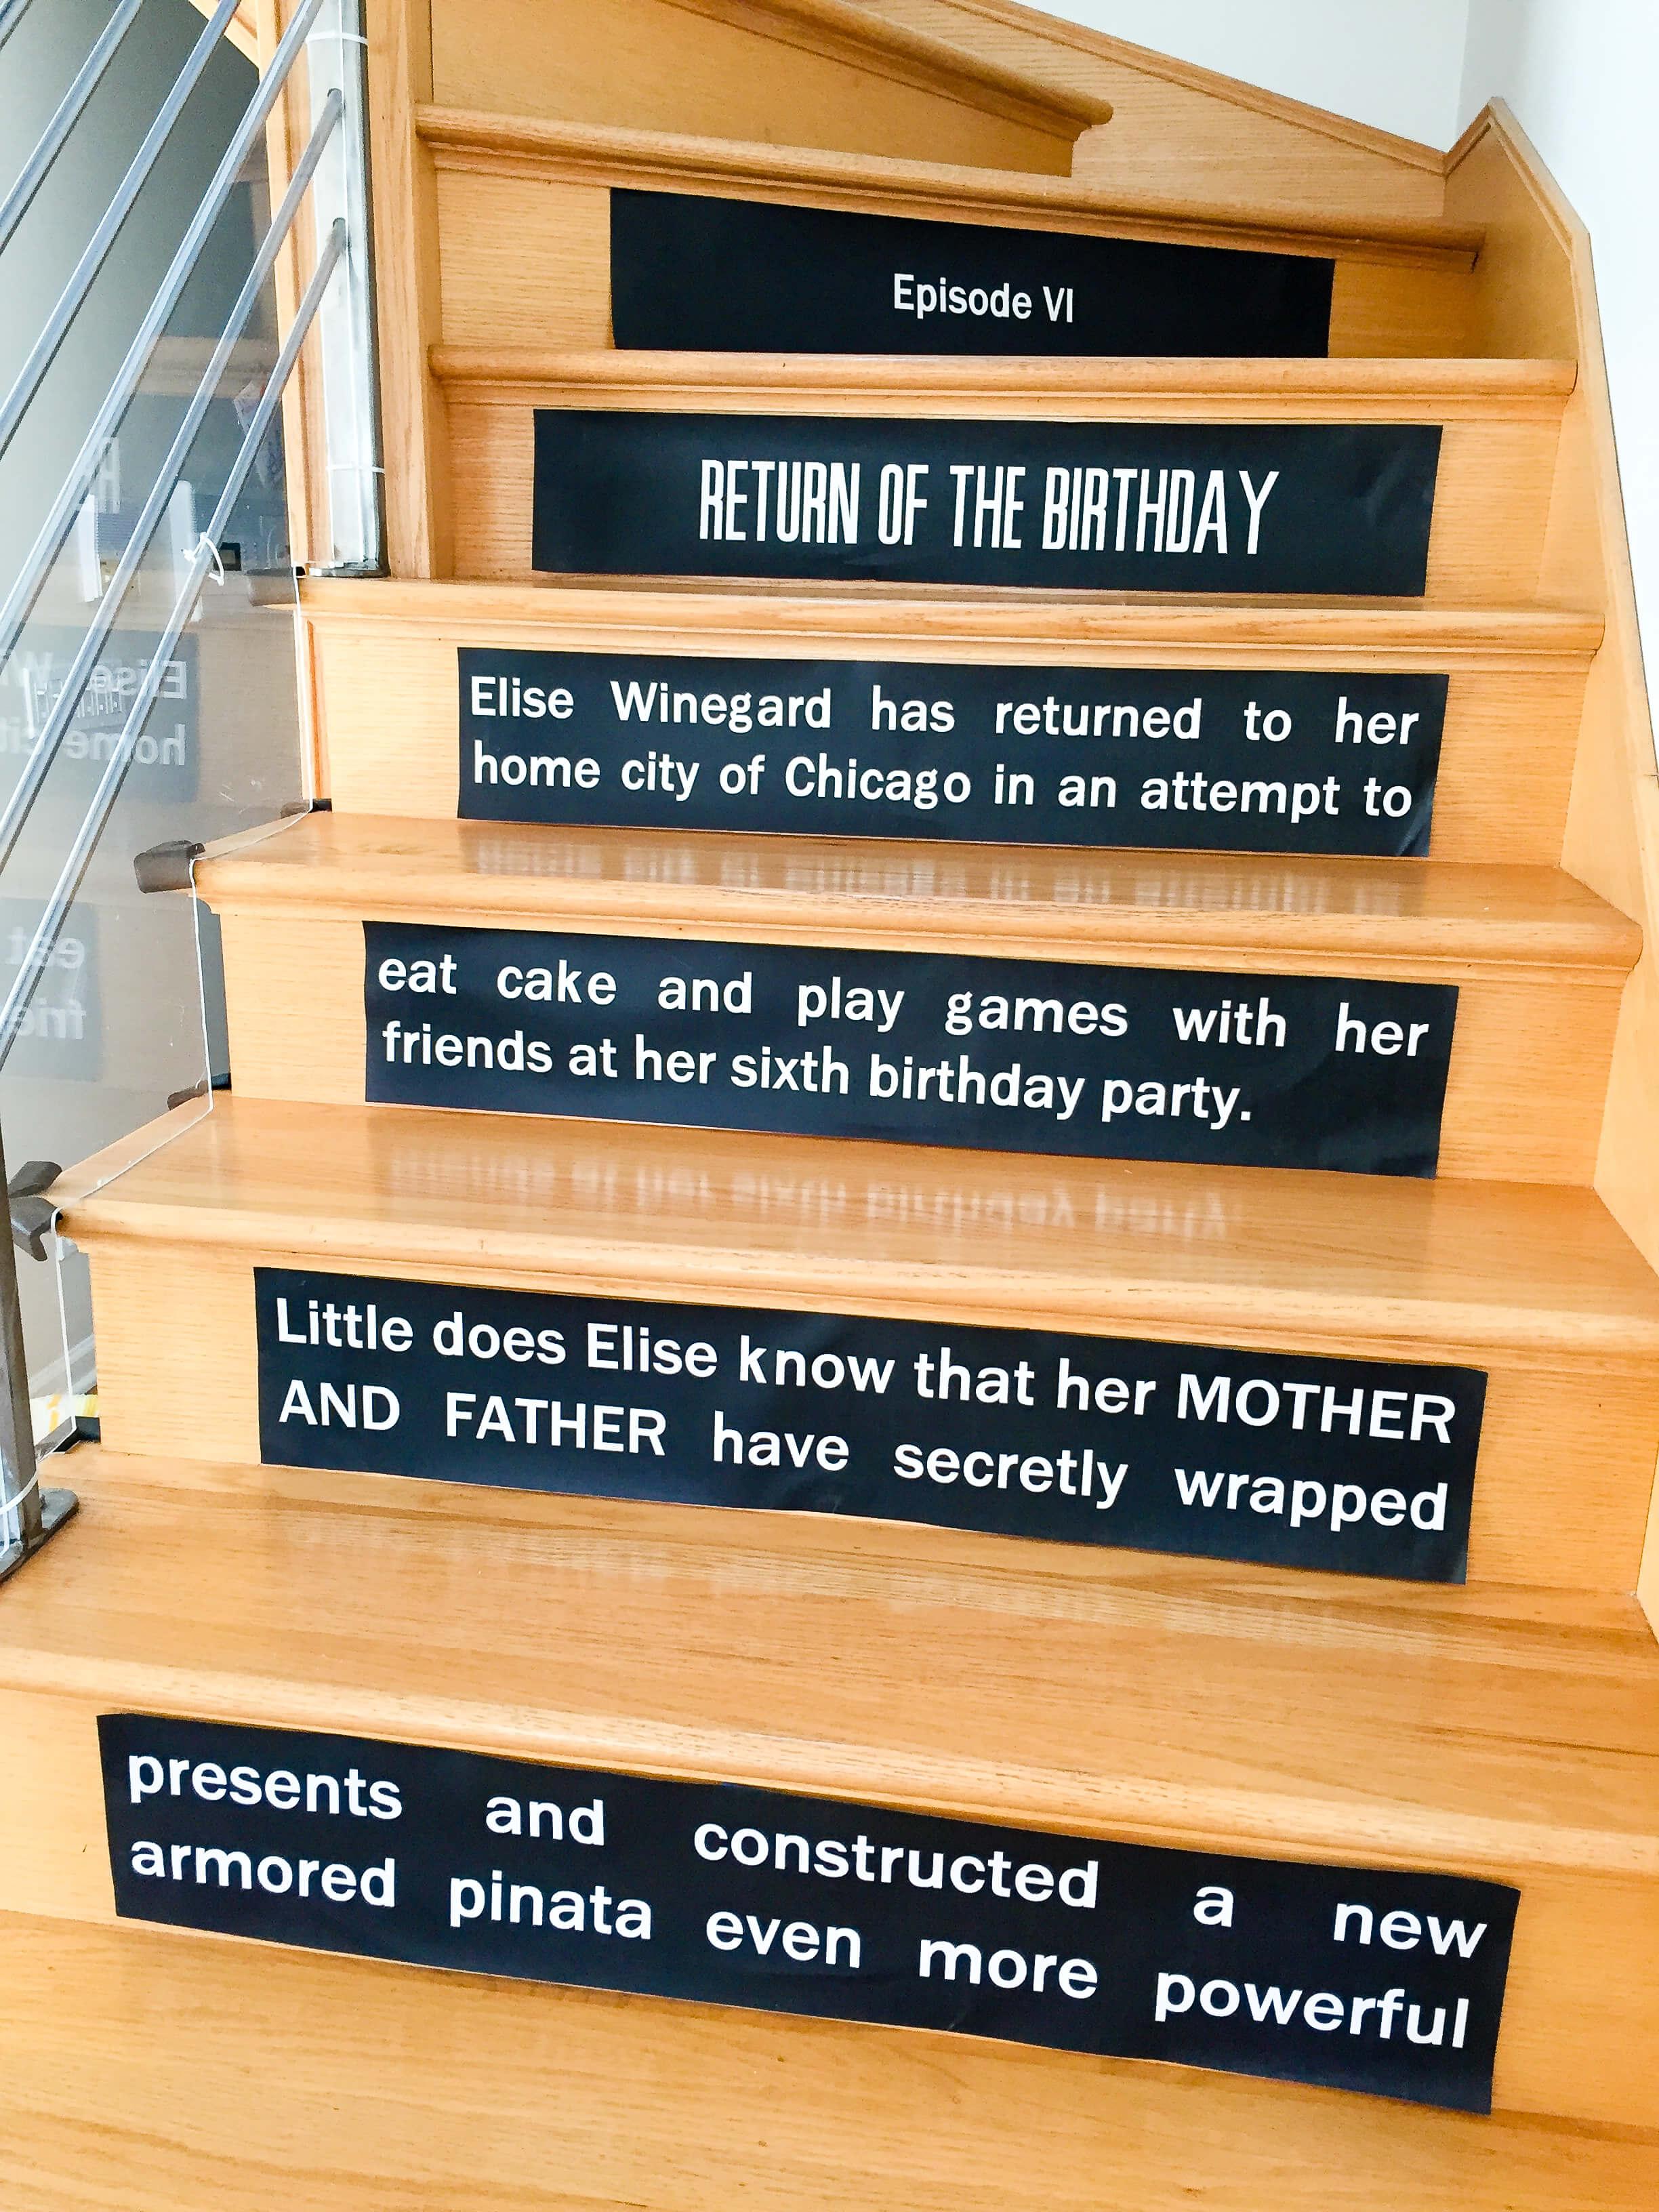 Star Wars Opening Crawl On Stairs Printable Star Wars